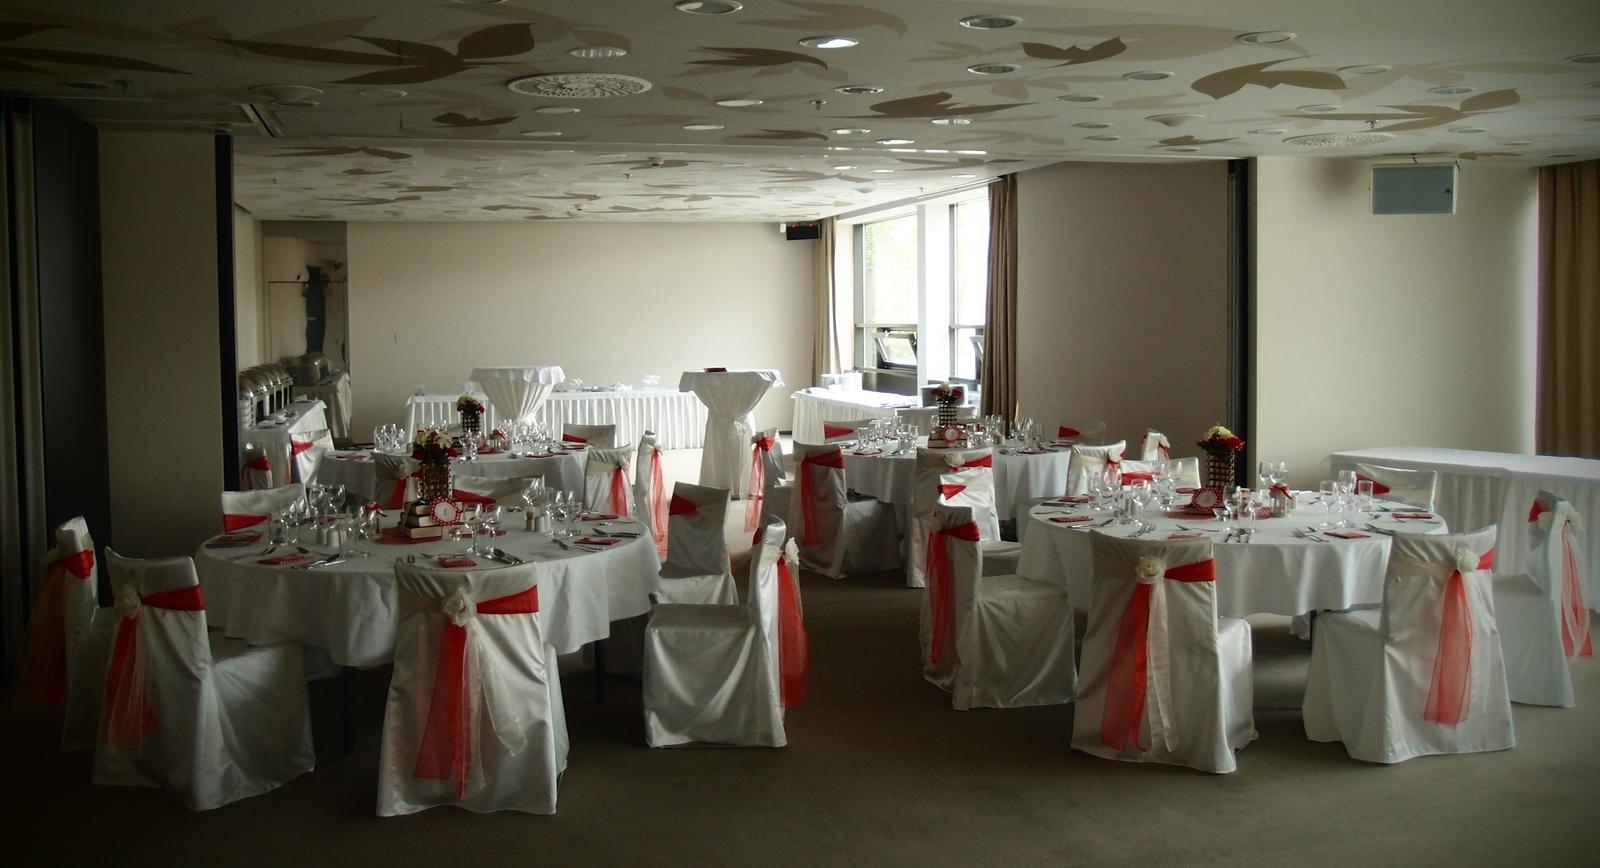 Hotel Yasmin - Obrázok č. 1